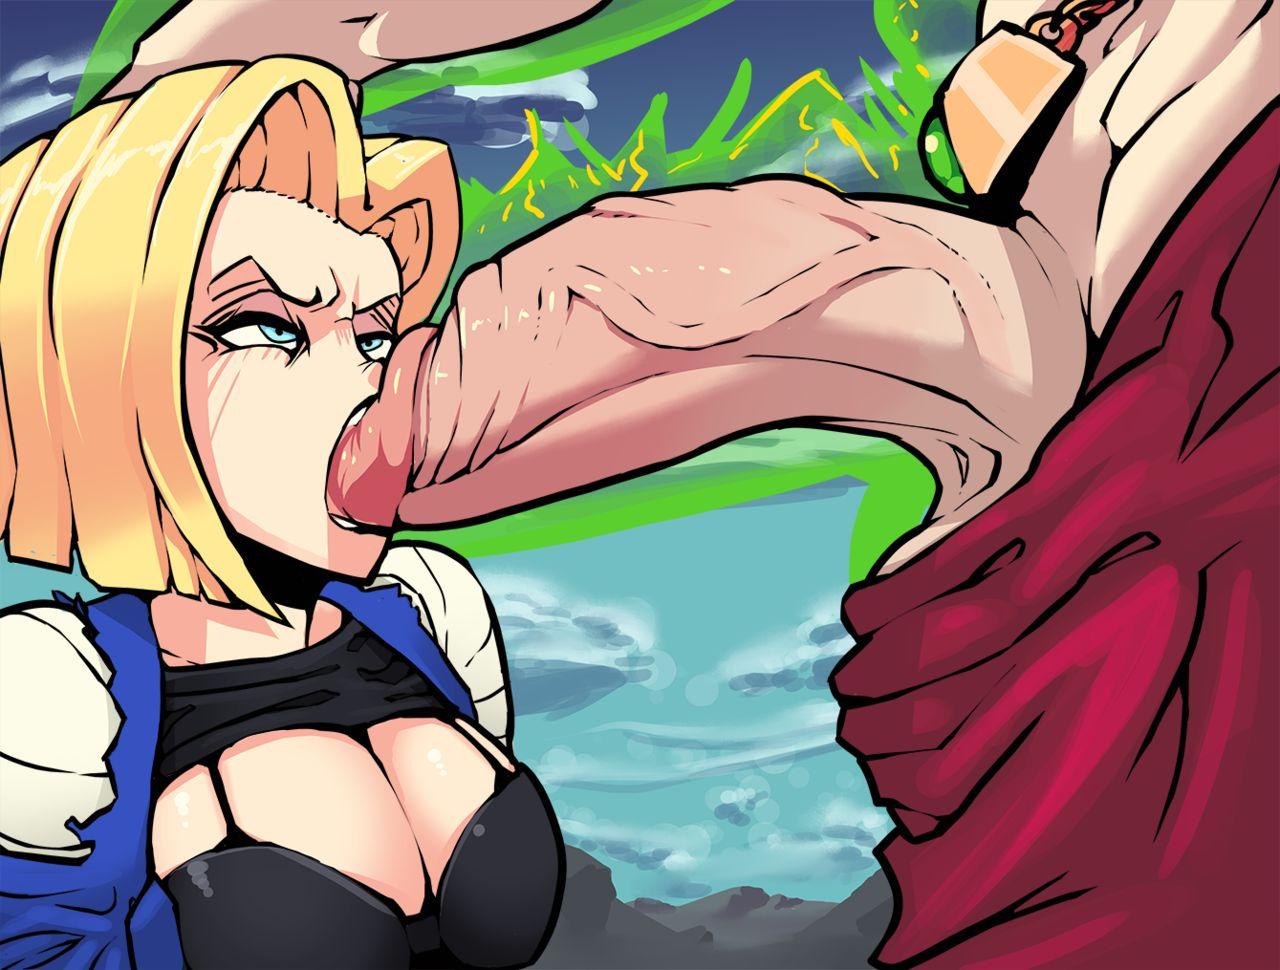 18 Dbz Porno read [boxerman] broly x android 18 (dragon ball z) hentai